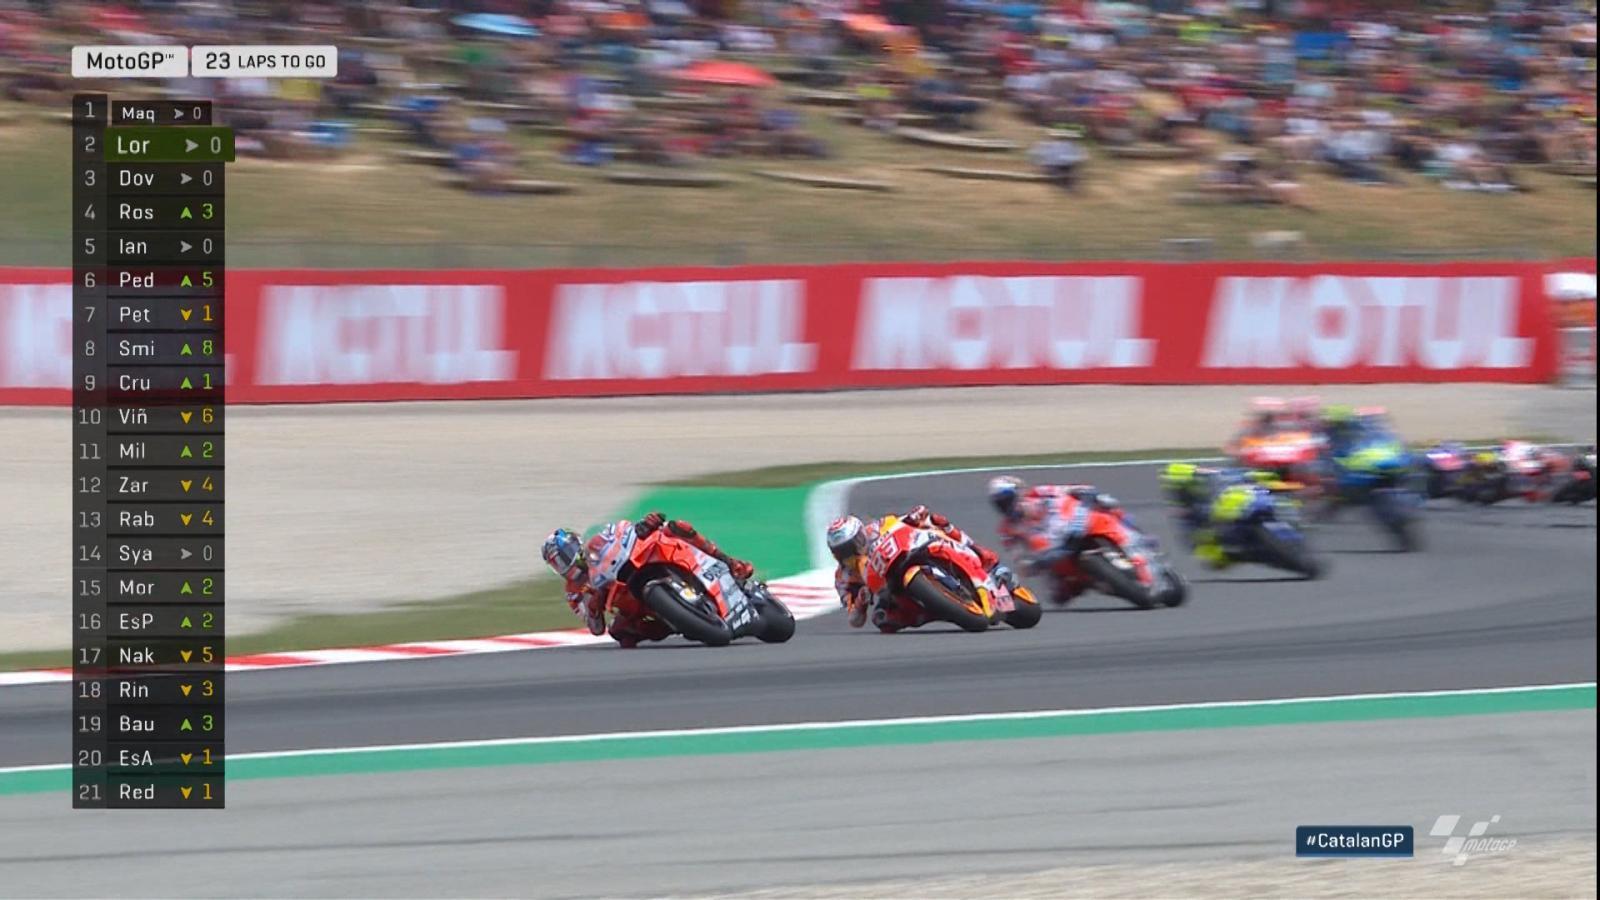 Ducati VS Honda!! ชมจังหวะ Jorge Lorenzo เเซง Marc Márquez